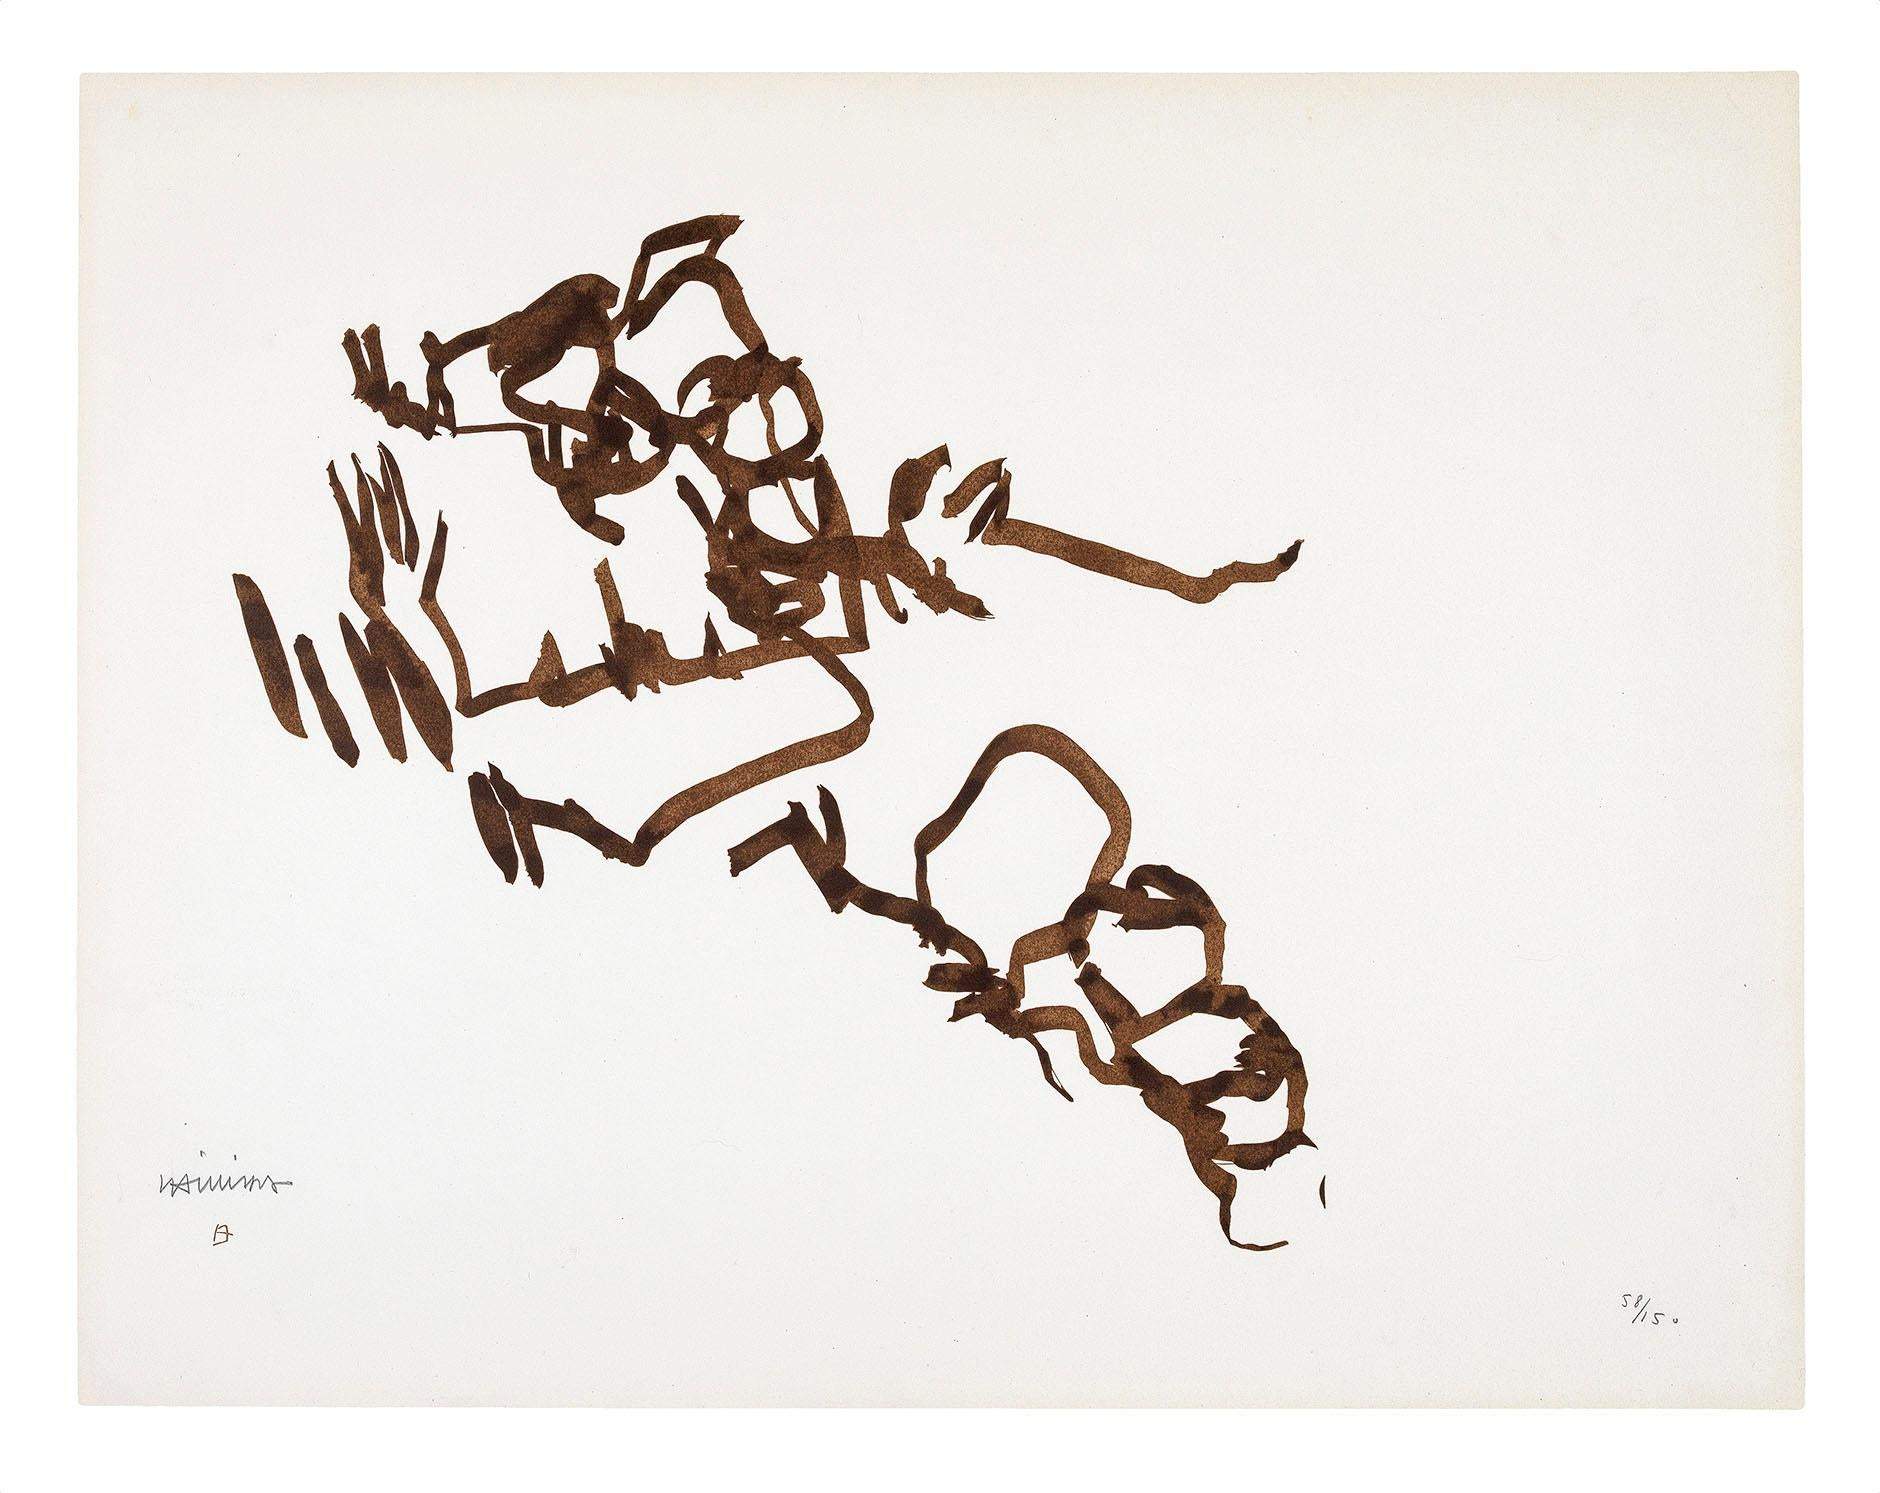 Concordia - Eduardo Chillida, Abstract Art, Contemporary Art, Prints, Lithograph